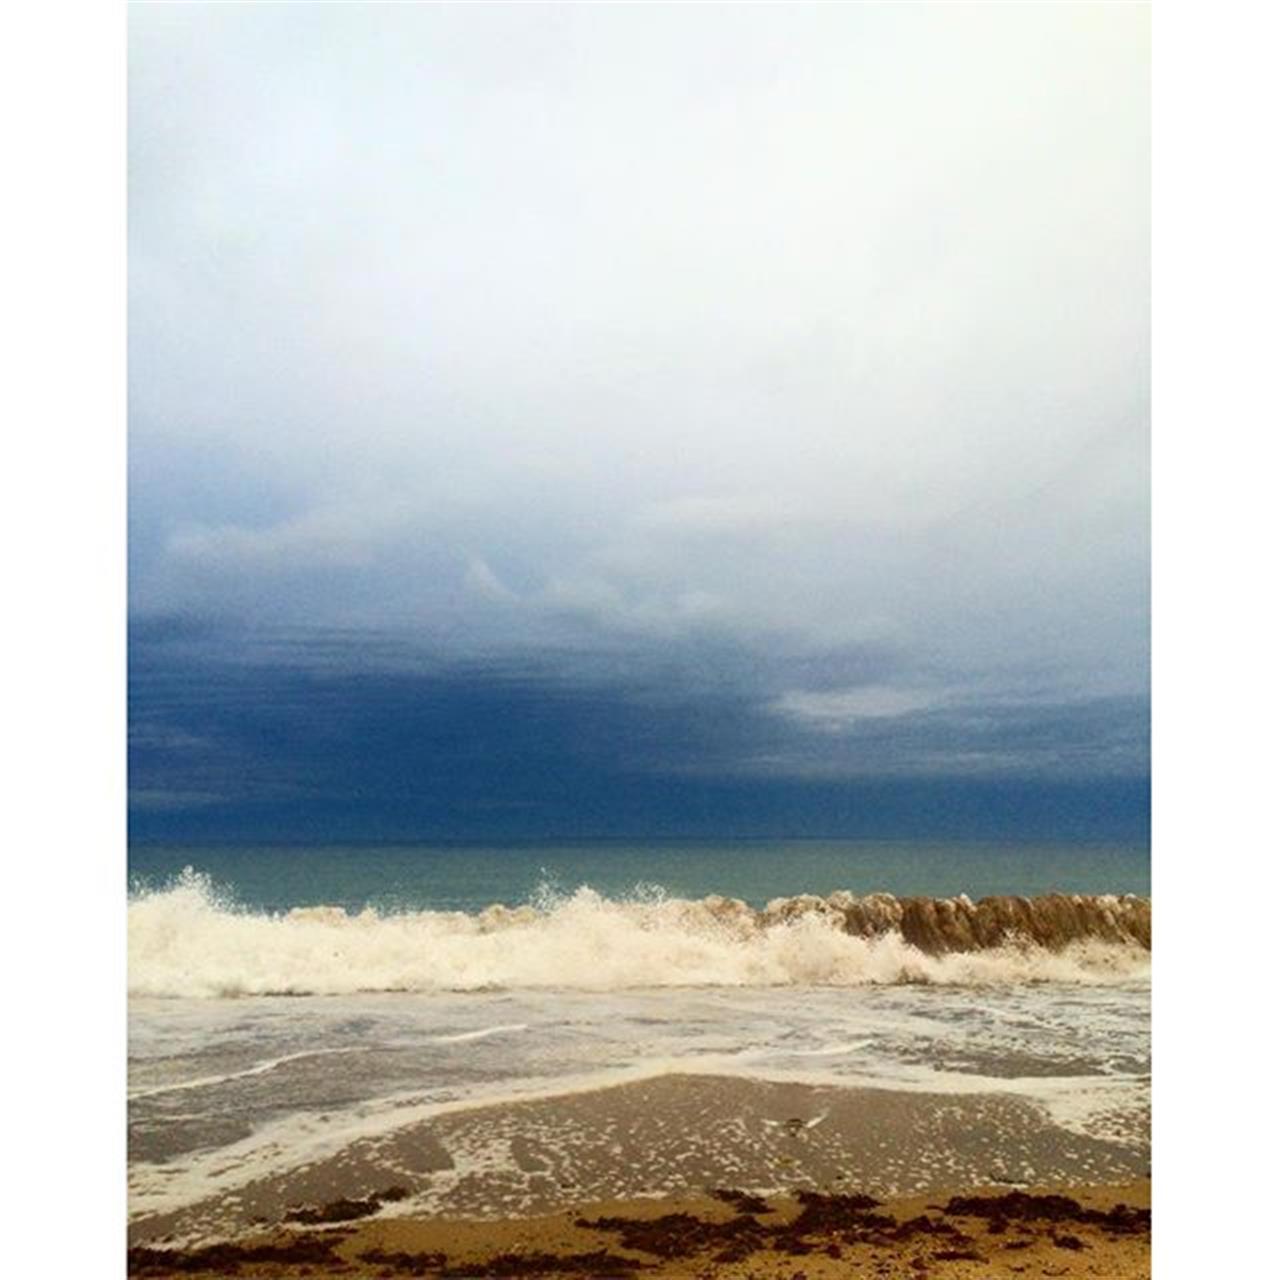 I love storms #sea #ocean #waves #nature #adventure #outdoors  #rhodeisland